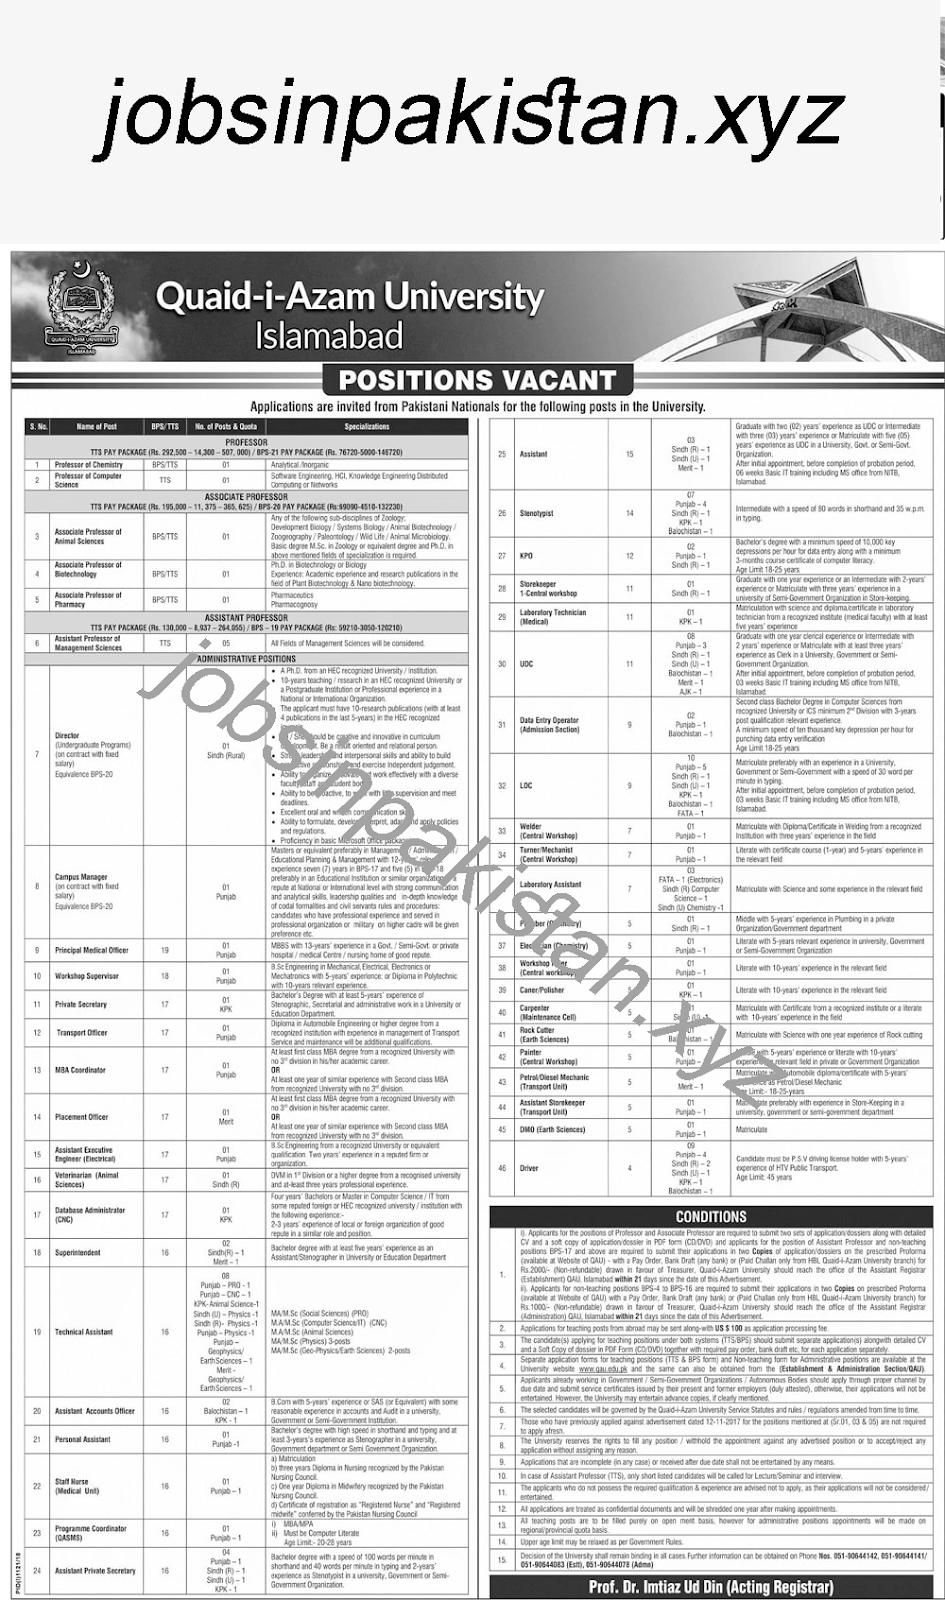 https://www.jobsinpakistan.xyz/2018/09/quaid-e-azam-university-islamabad-jobs.html